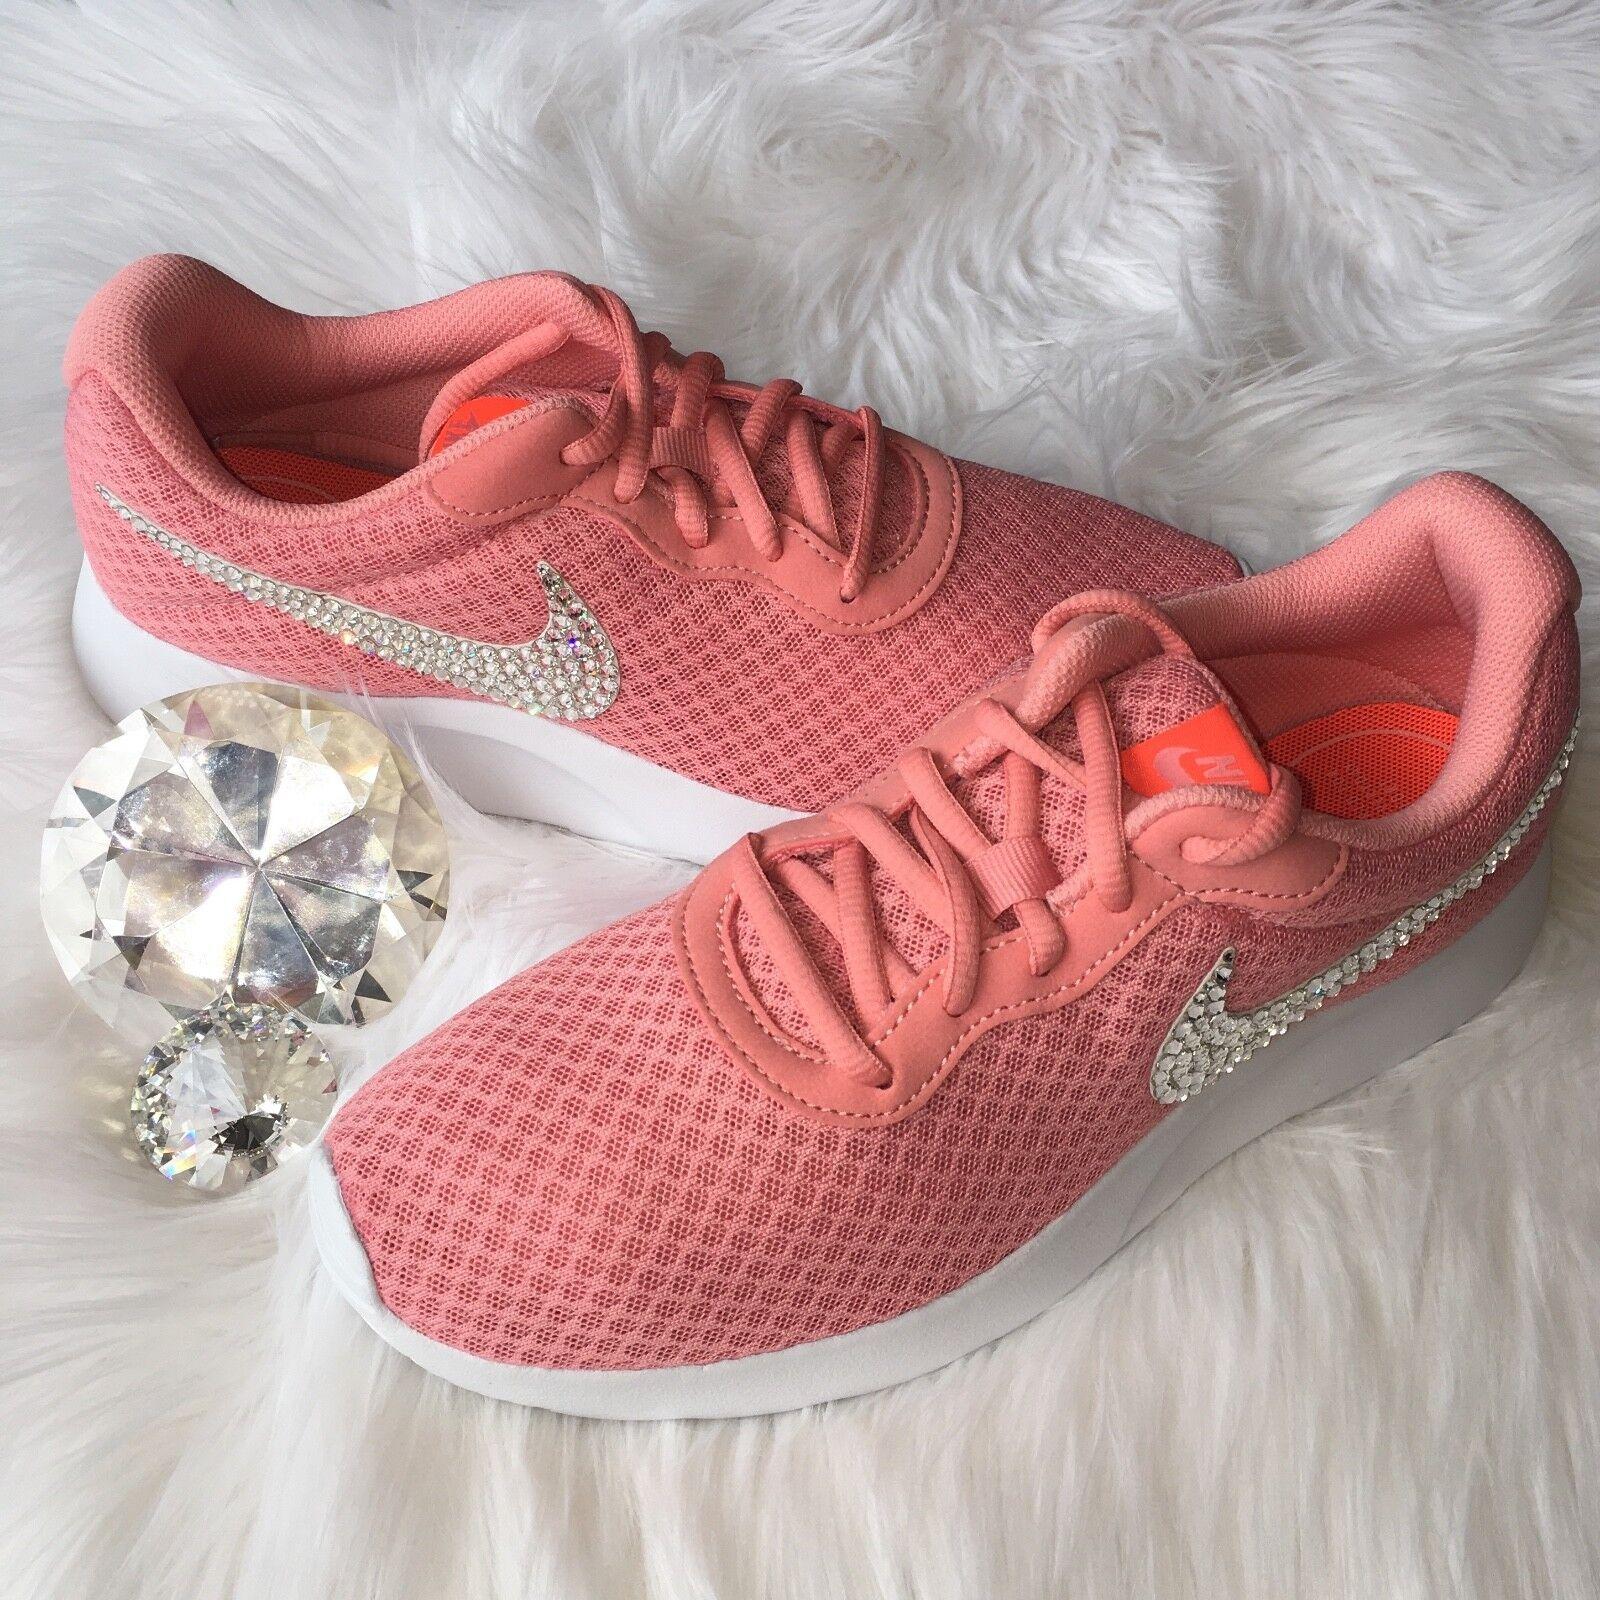 Bling Nike Tanjun shoes with Swarovski Crystal Diamond Rhinestone  Coral  White